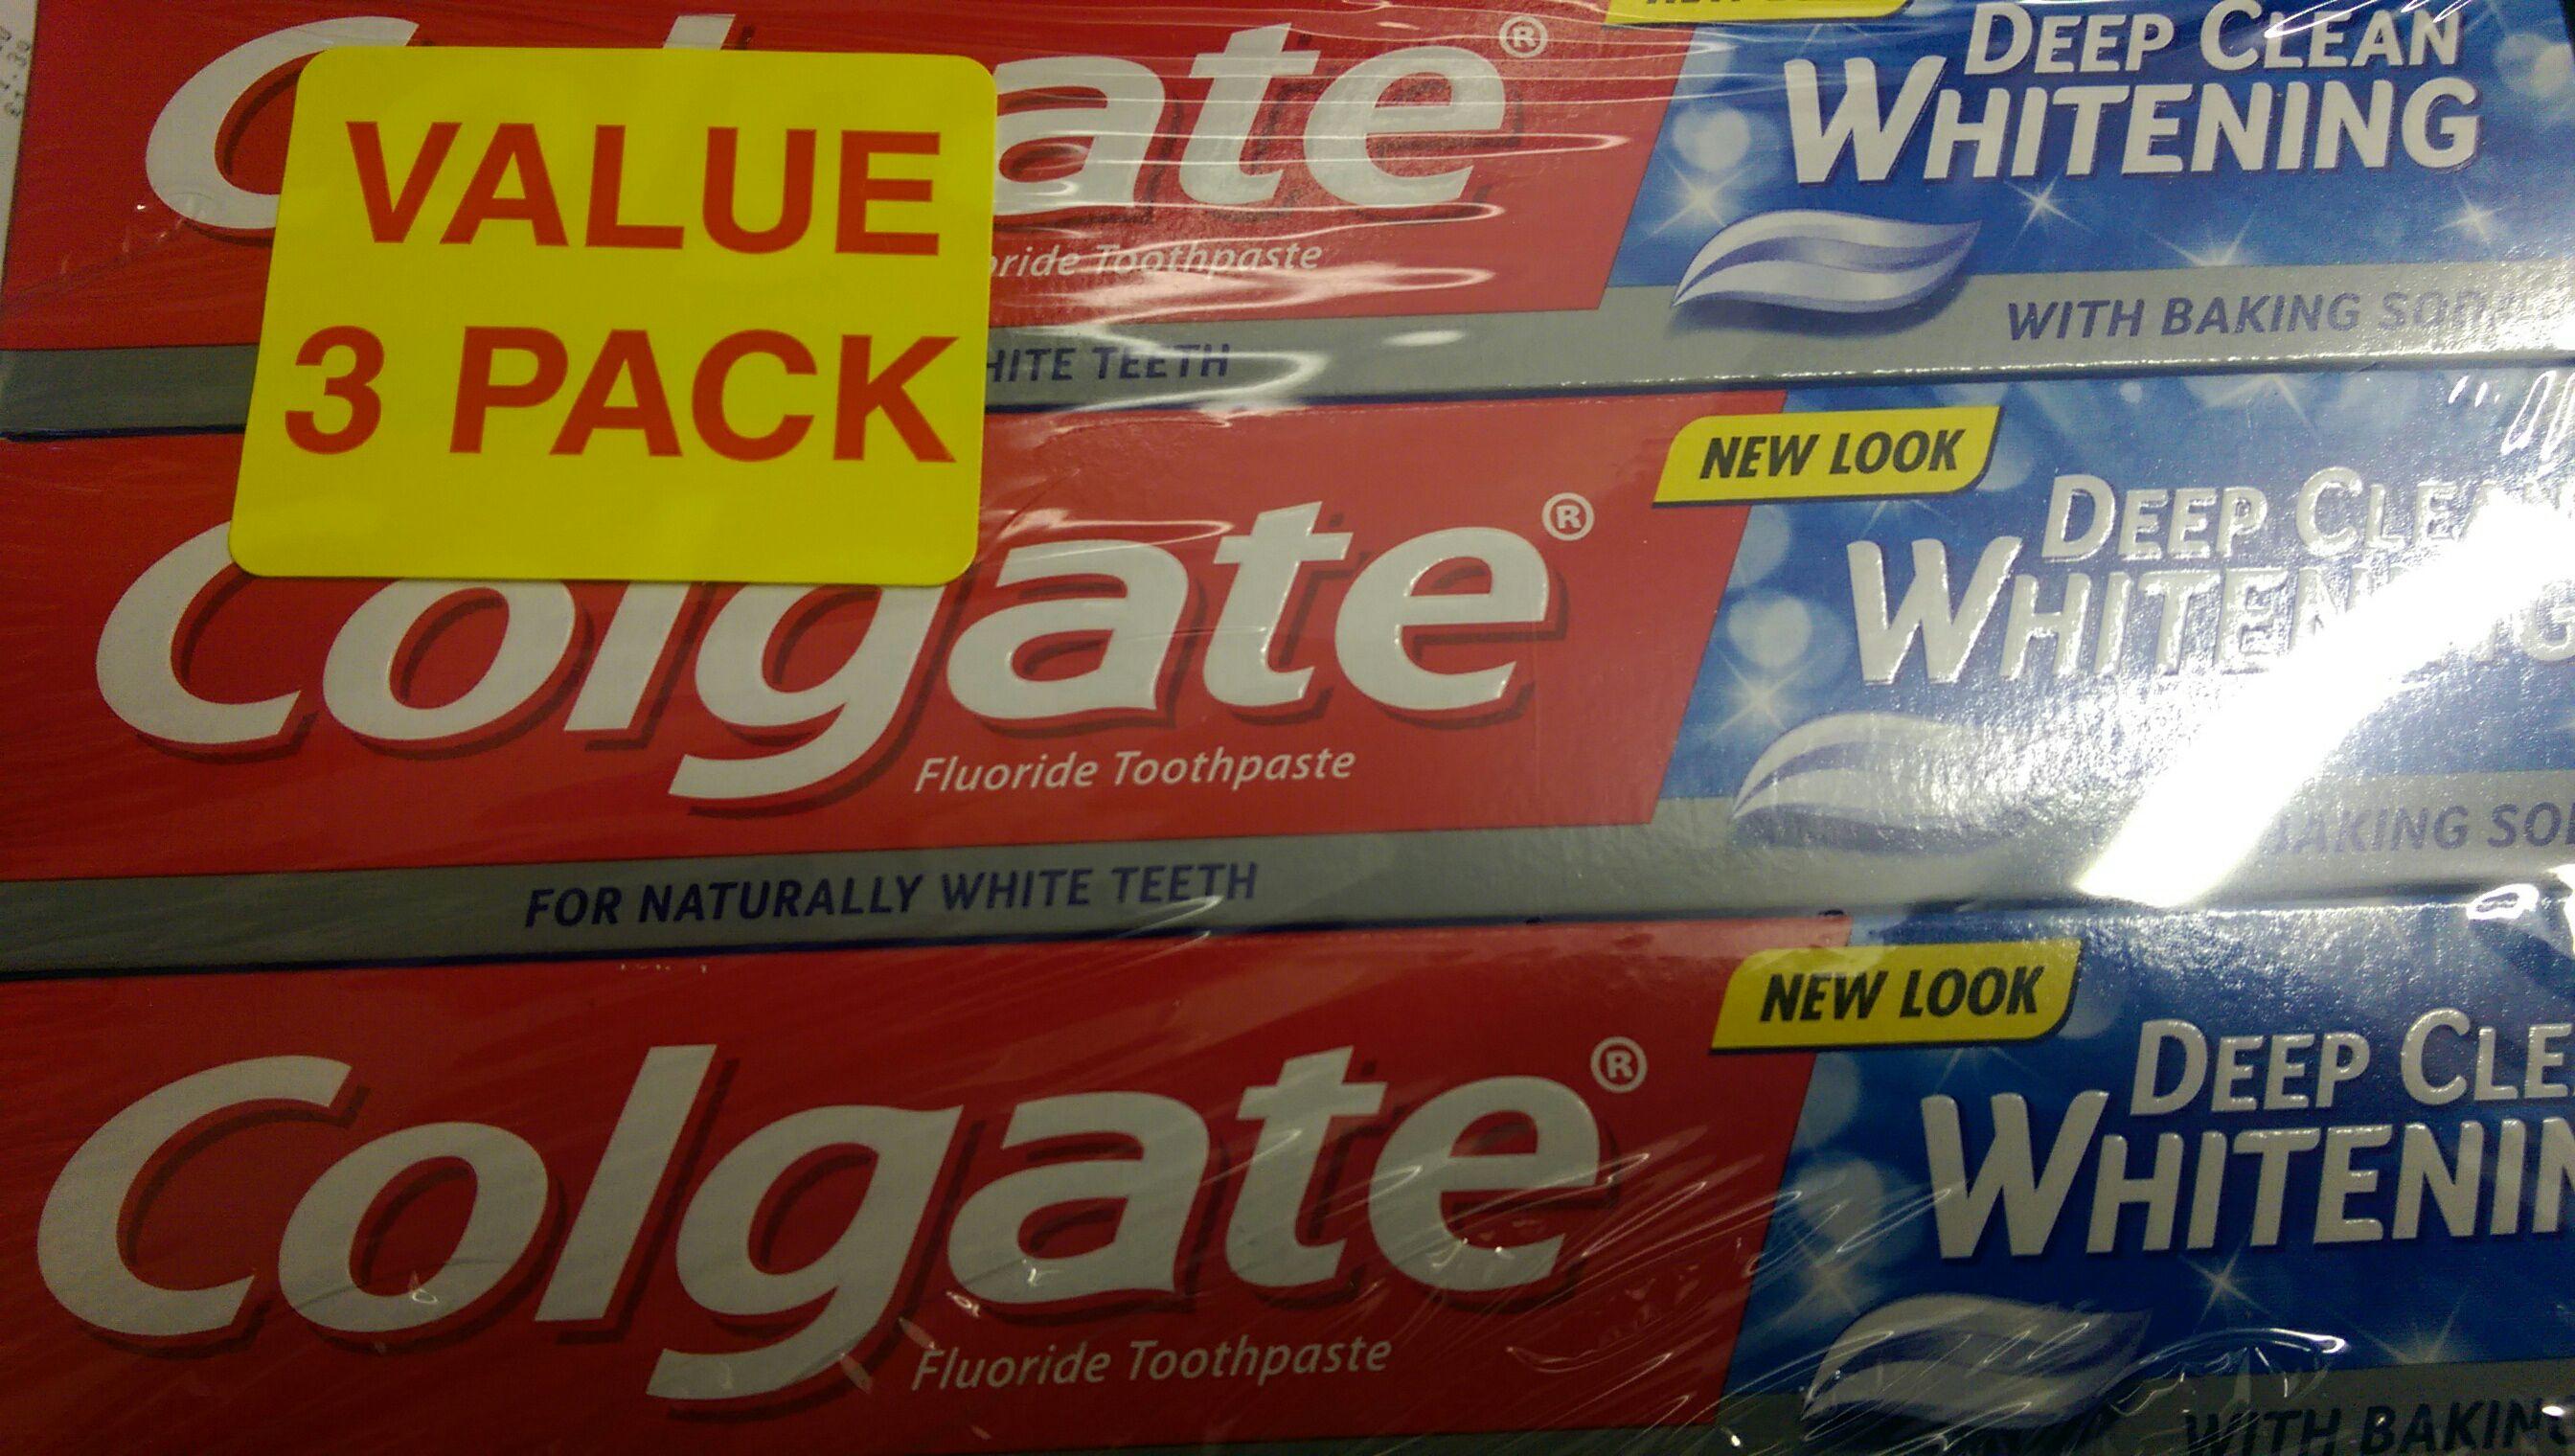 Tesco in-store, 3 pack of Colgate Deep Clean Toothpaste 75ml £1.25